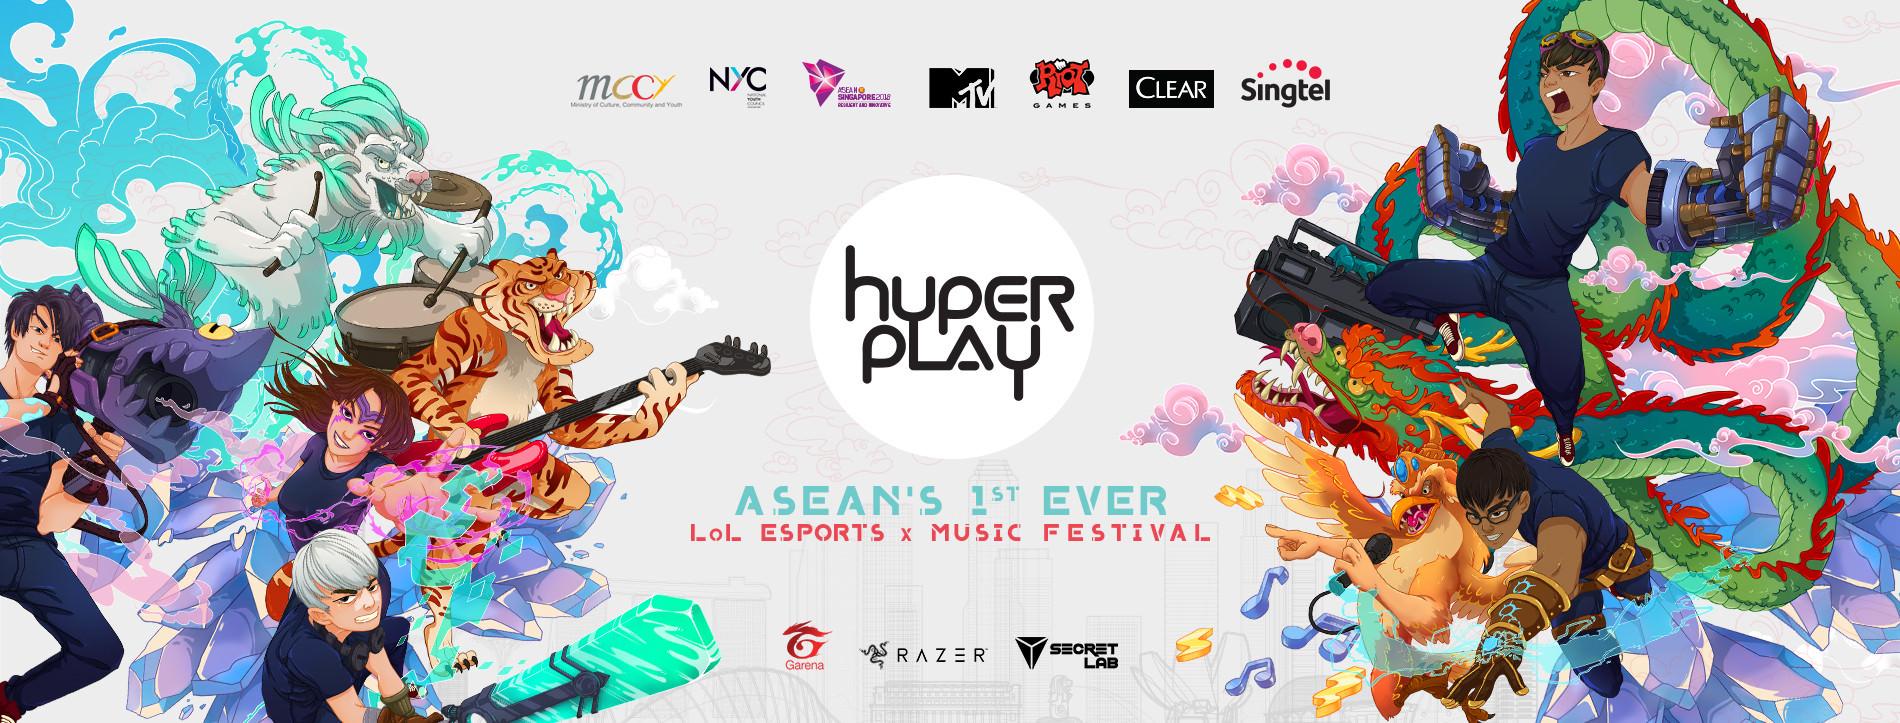 Hyperplay 2018, ASEAN, esports, music festival, Singapore, Malaysia, e-sports, league of legends